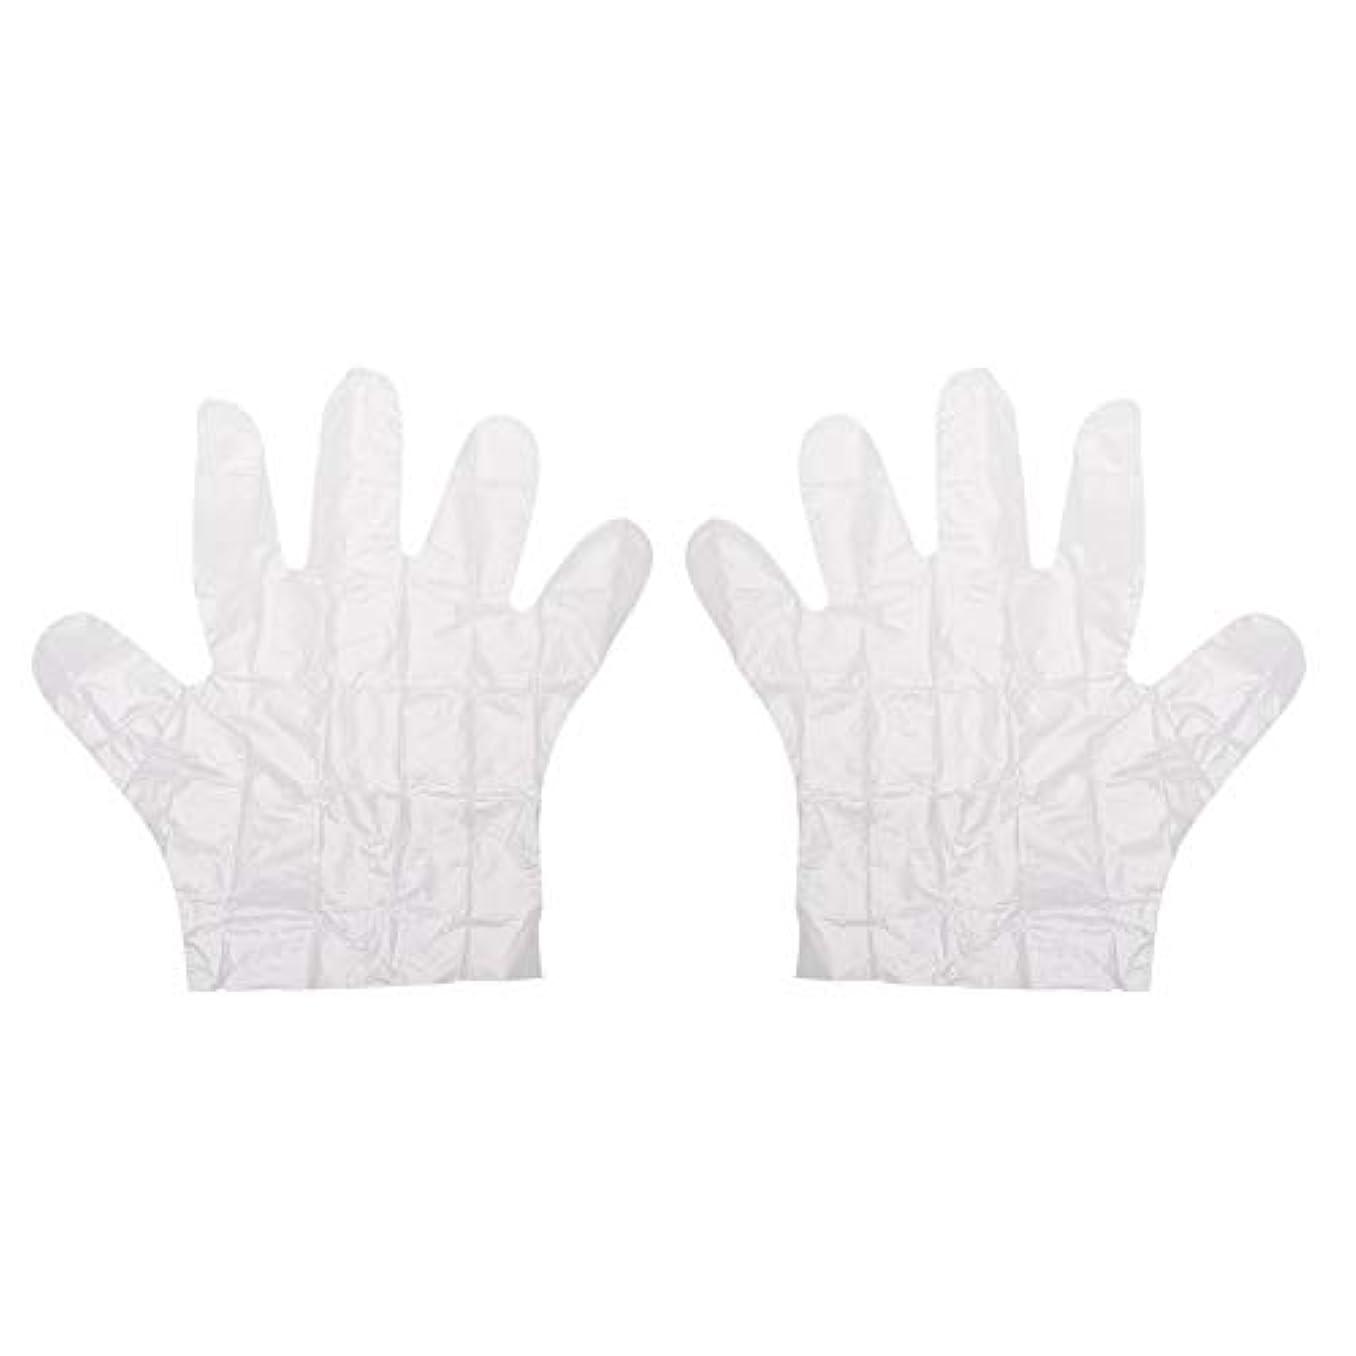 WISTOMJP 200枚 子供用手袋使い捨て 使い捨て手袋 キッズ専用透明 手袋